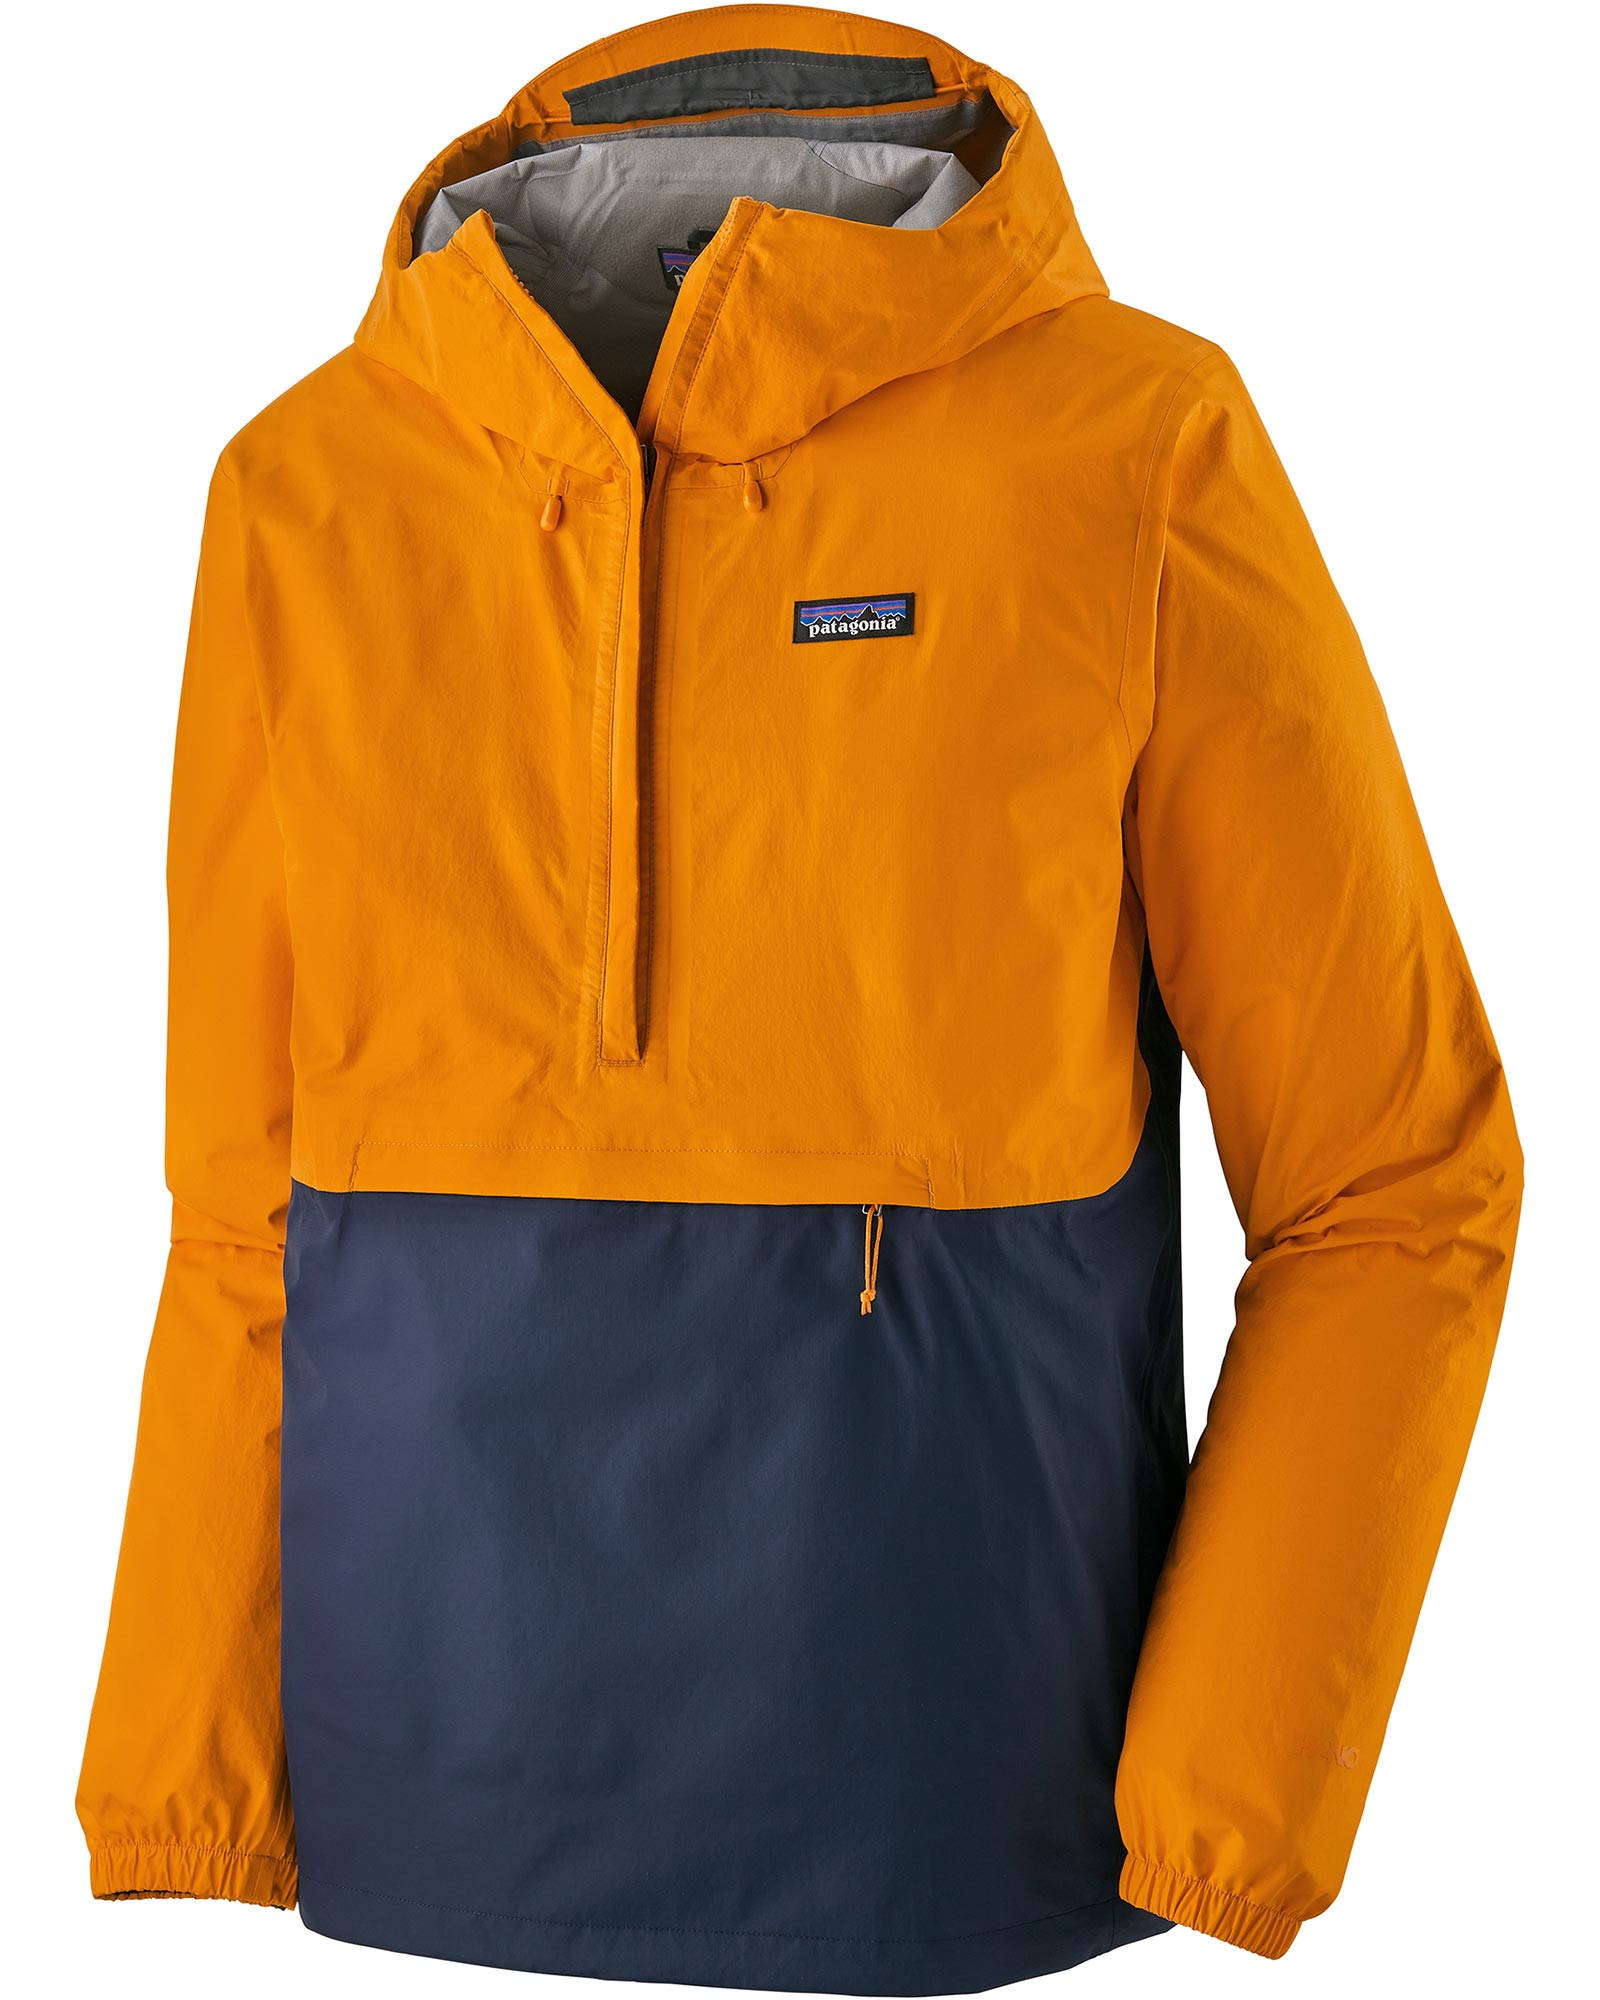 Patagonia Torrentshell 3L Men's Pullover 0